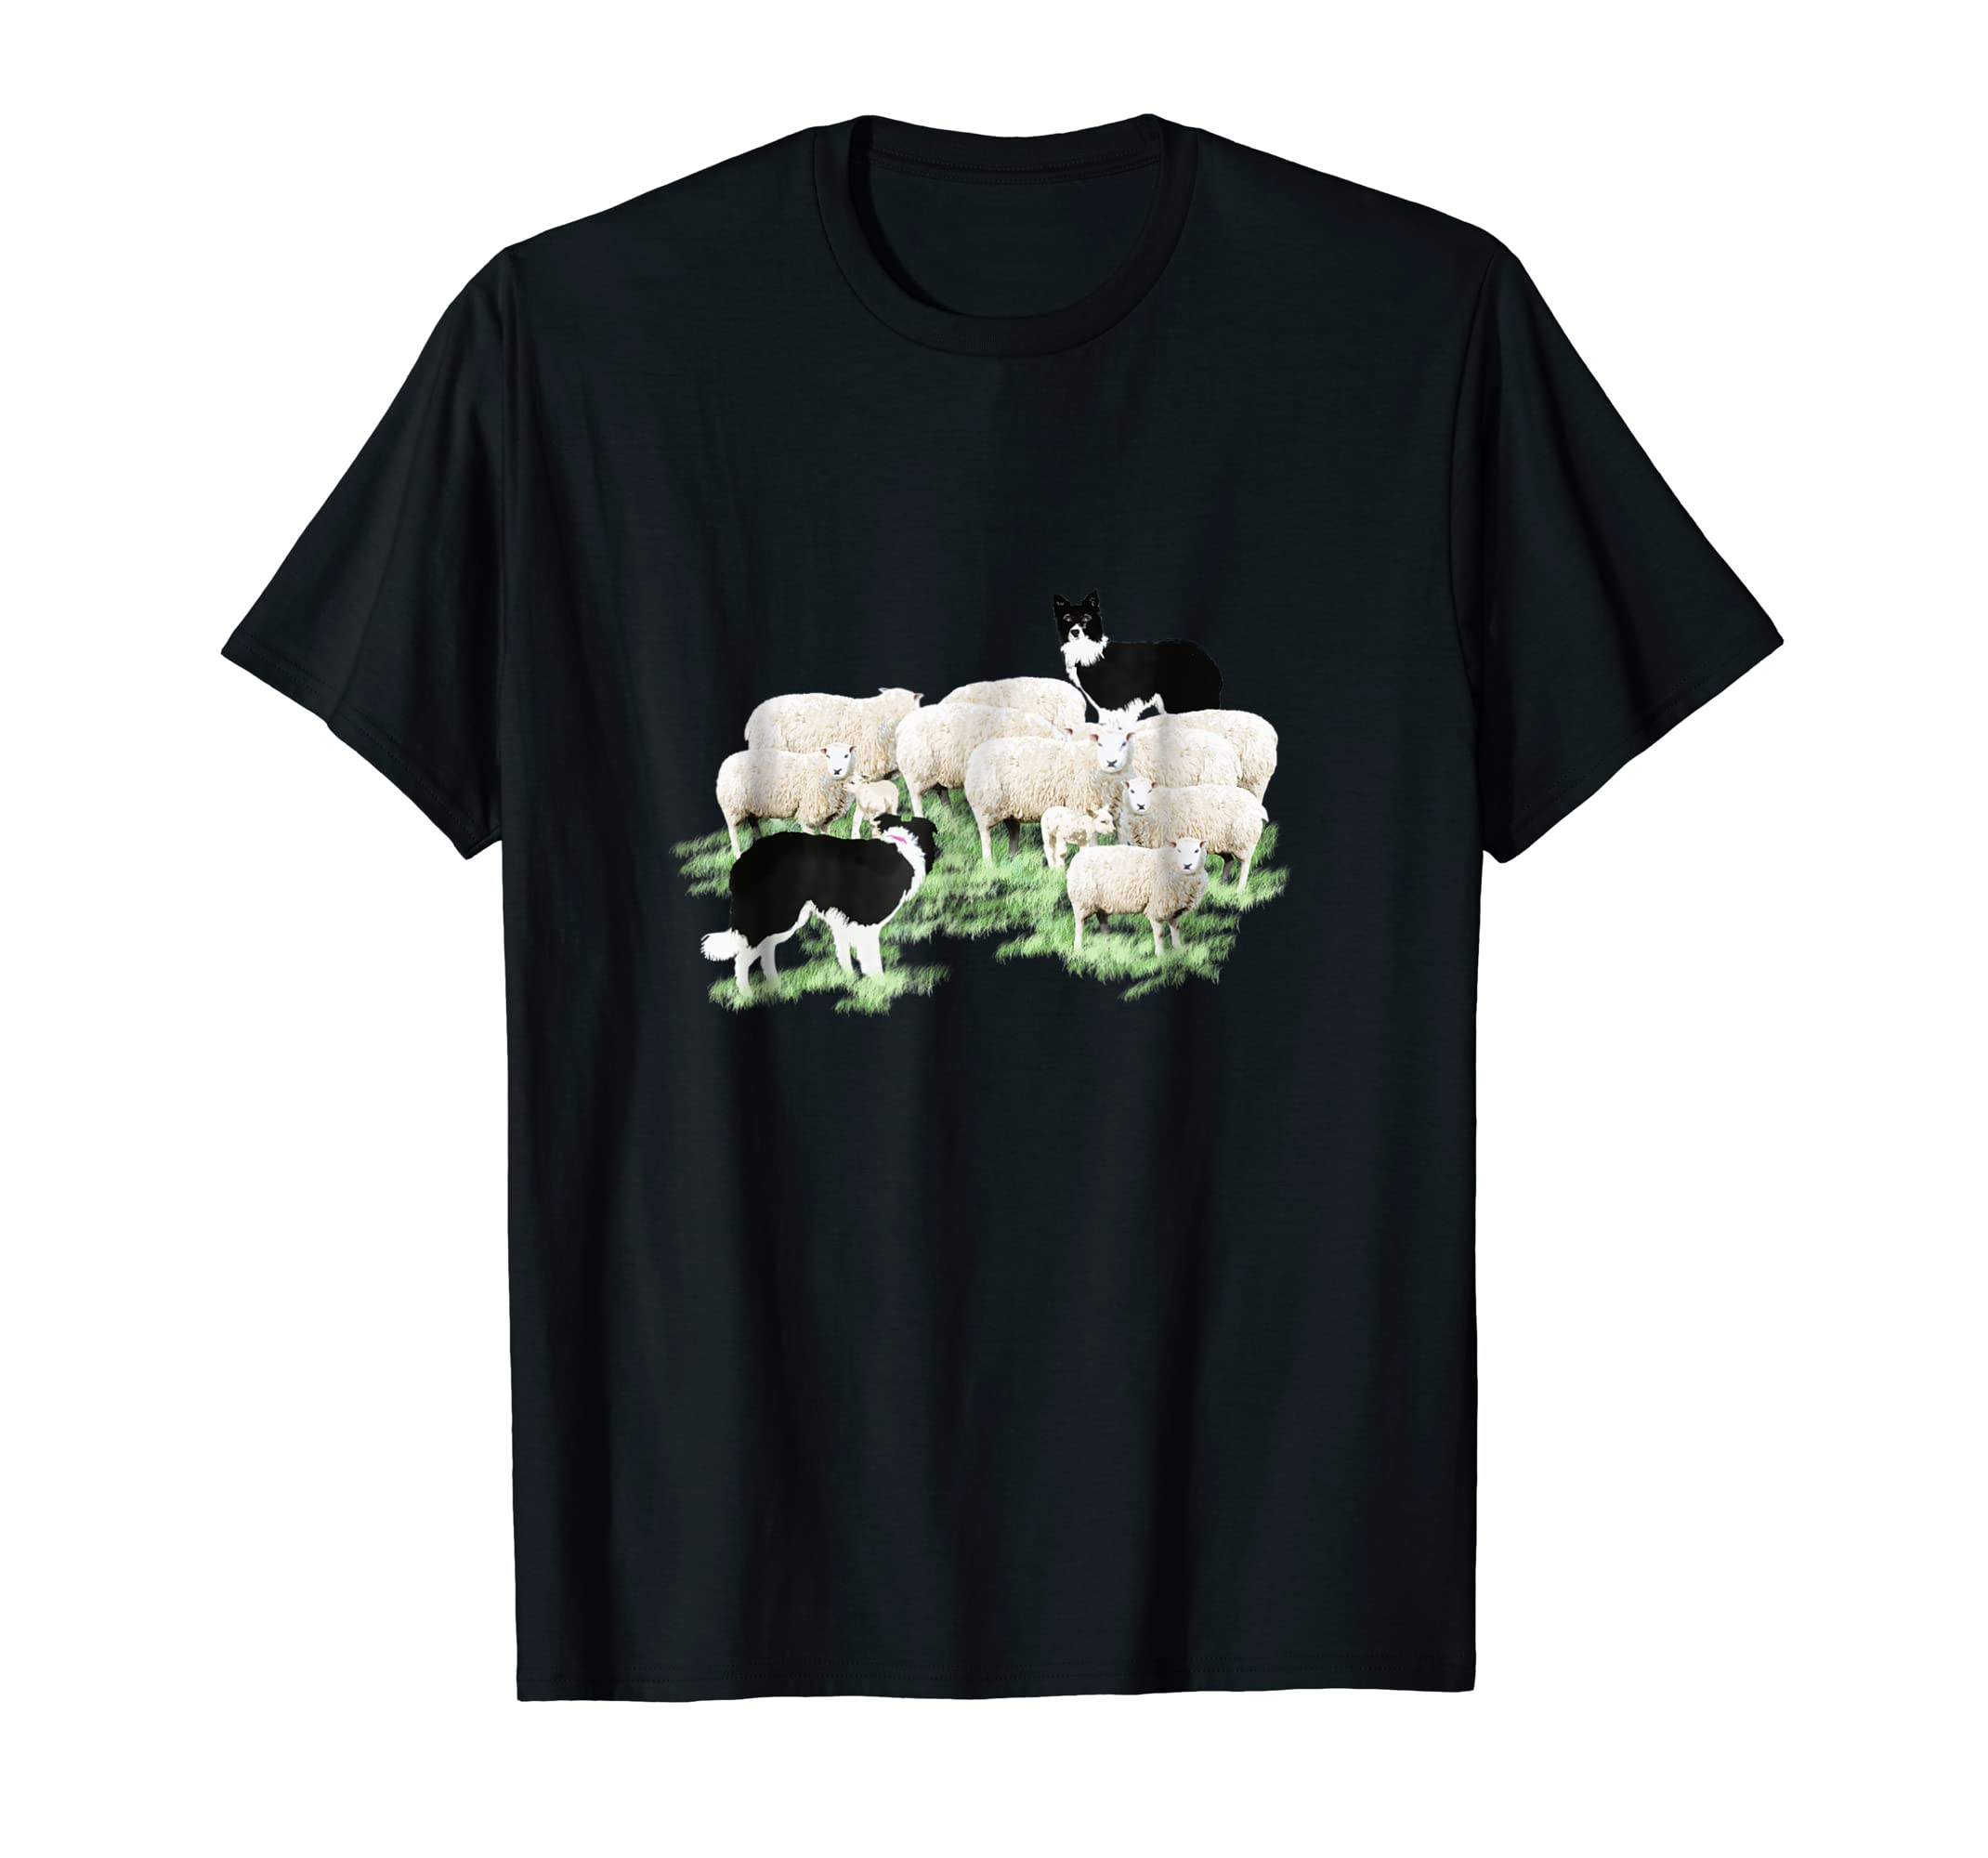 Border Collie Dogs Herding Sheep T-Shirt-Men's T-Shirt-Black